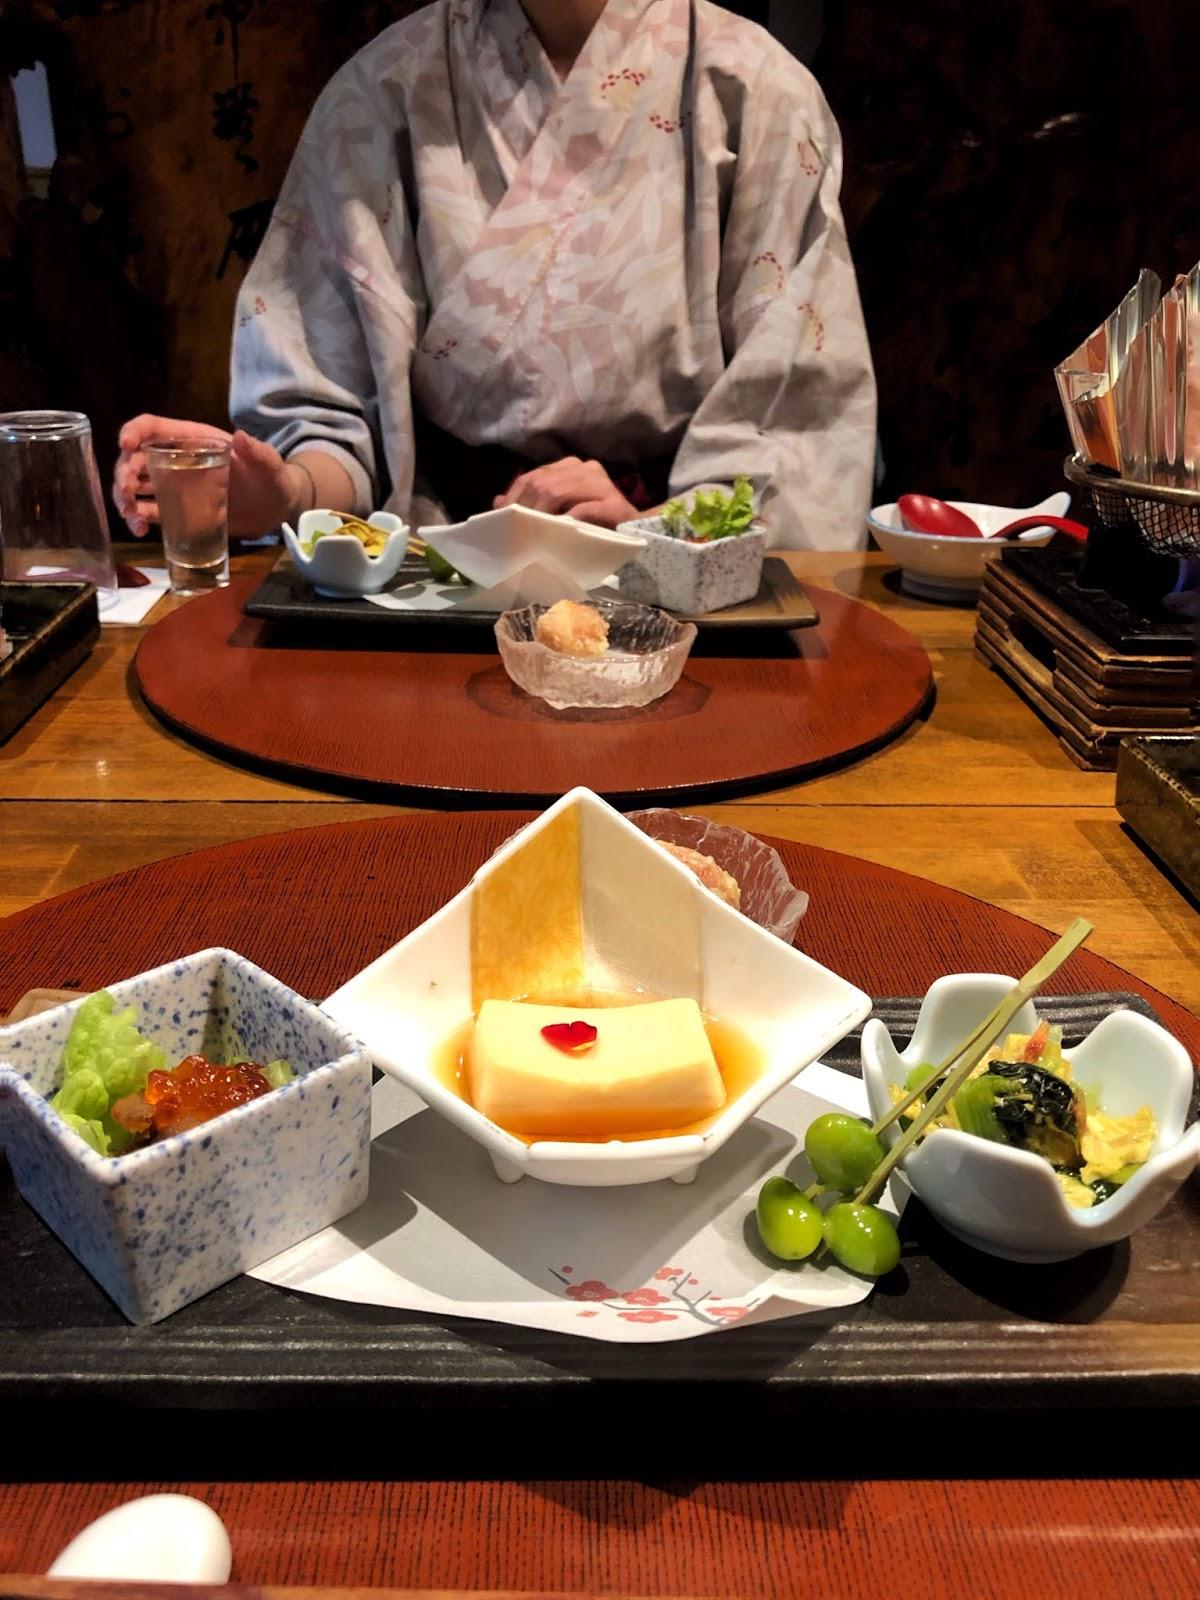 Kaiseki dinner, Biggest open-air bath onsen in Japan. Takaragawa Onsen, Minakami Gunma, Japan / FOREVERVANNY.com